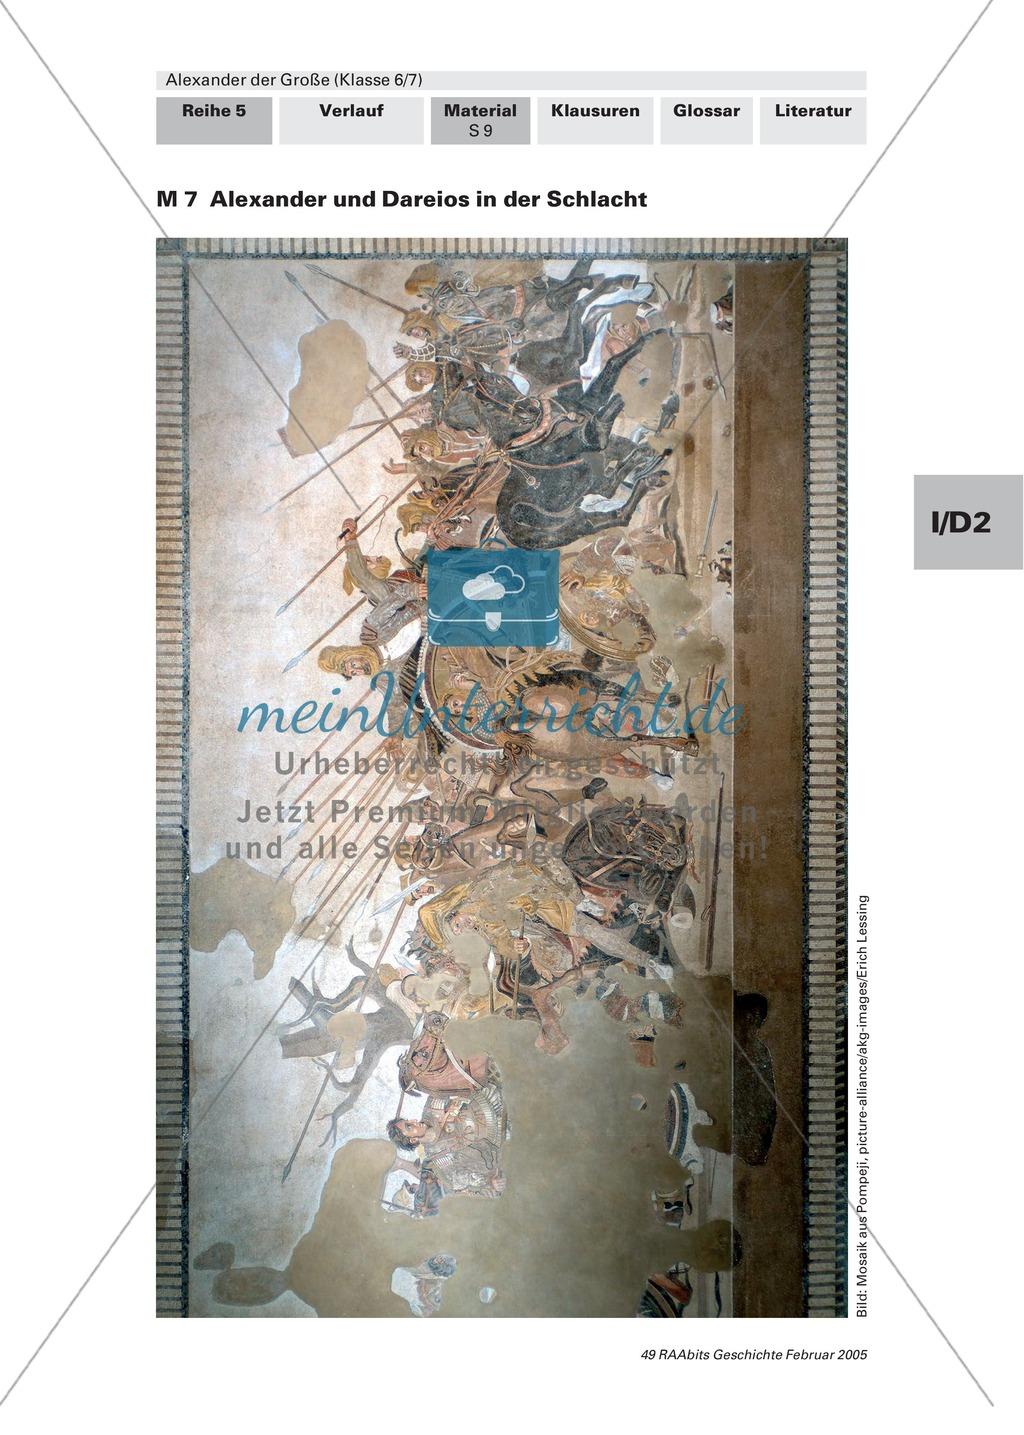 Alexander der Große: Eroberungsfeldzüge an Autorentexten, Karten, Bildern Preview 5